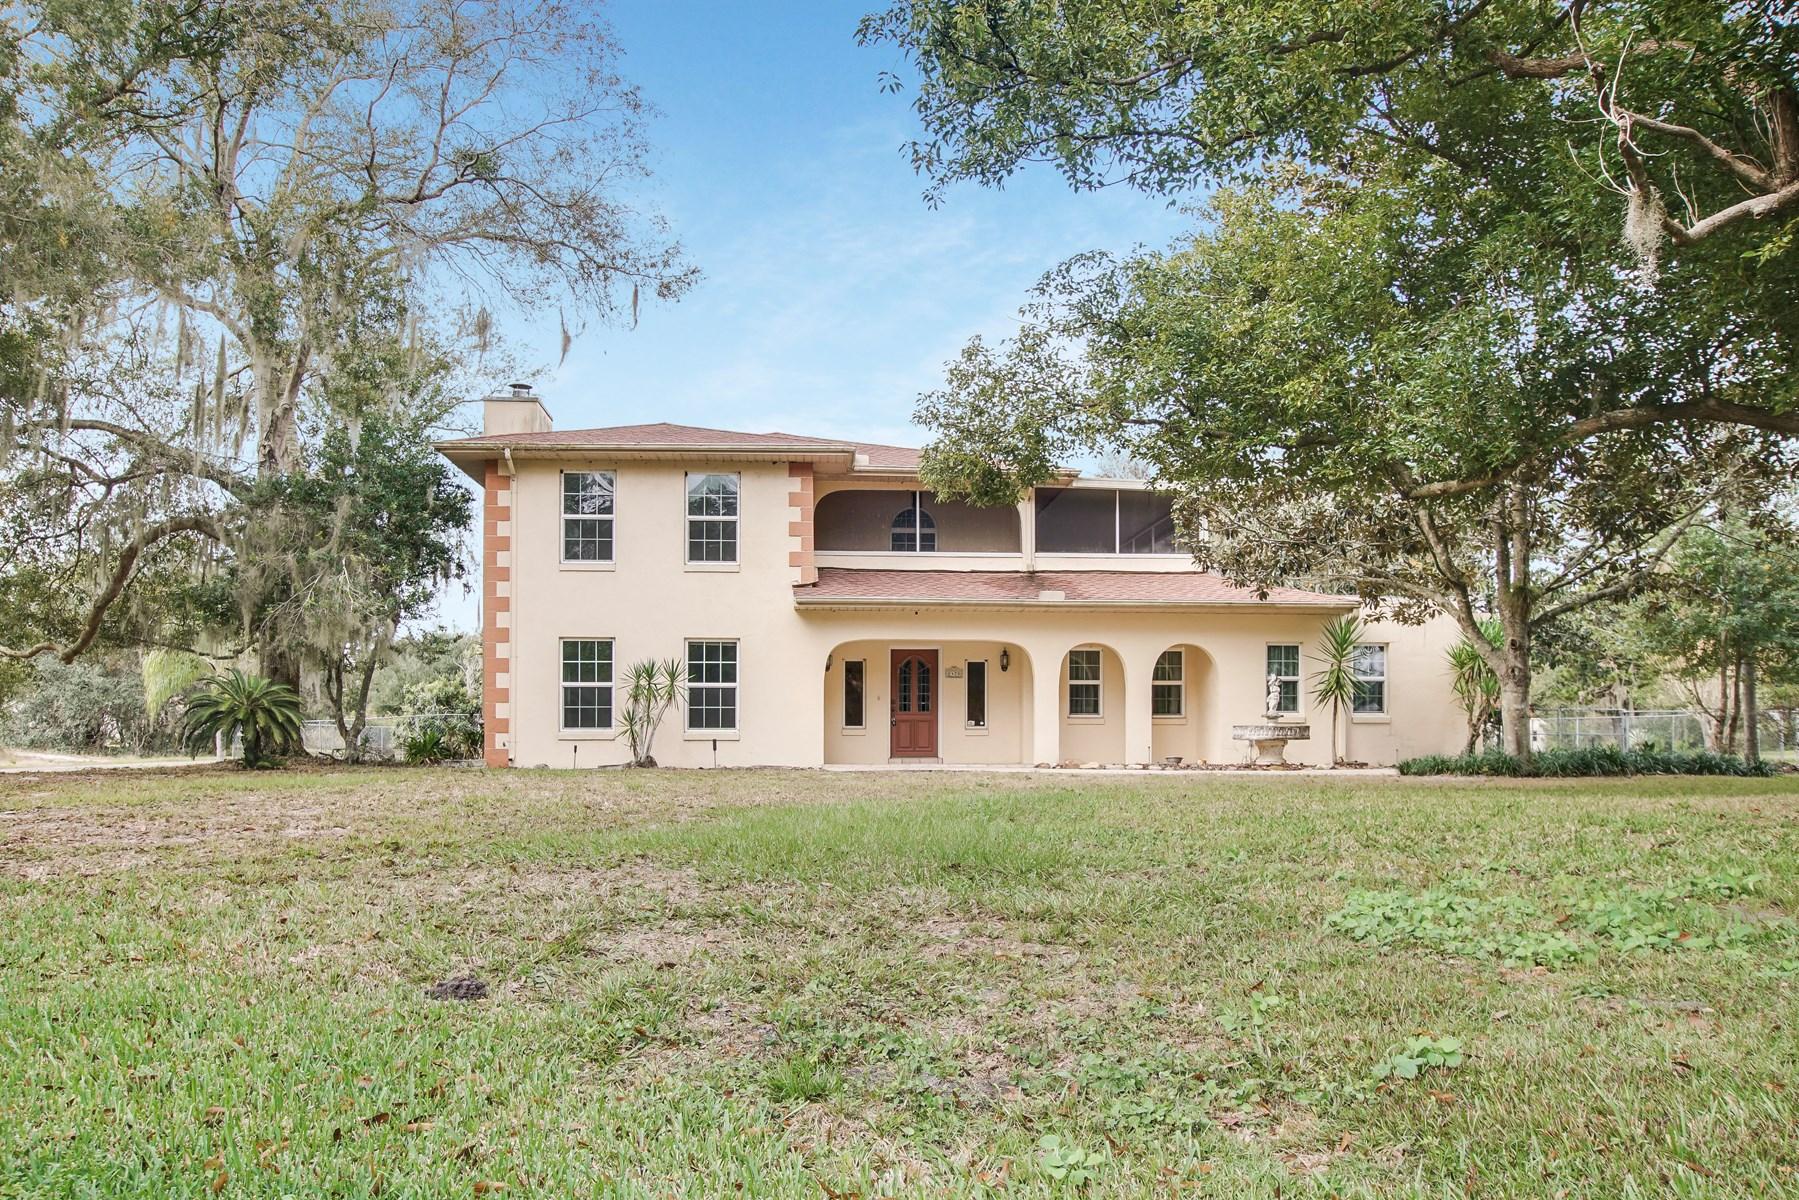 2 STORY MEDITERRANEAN HOME, CENTRAL FLORIDA, LAKE WALES